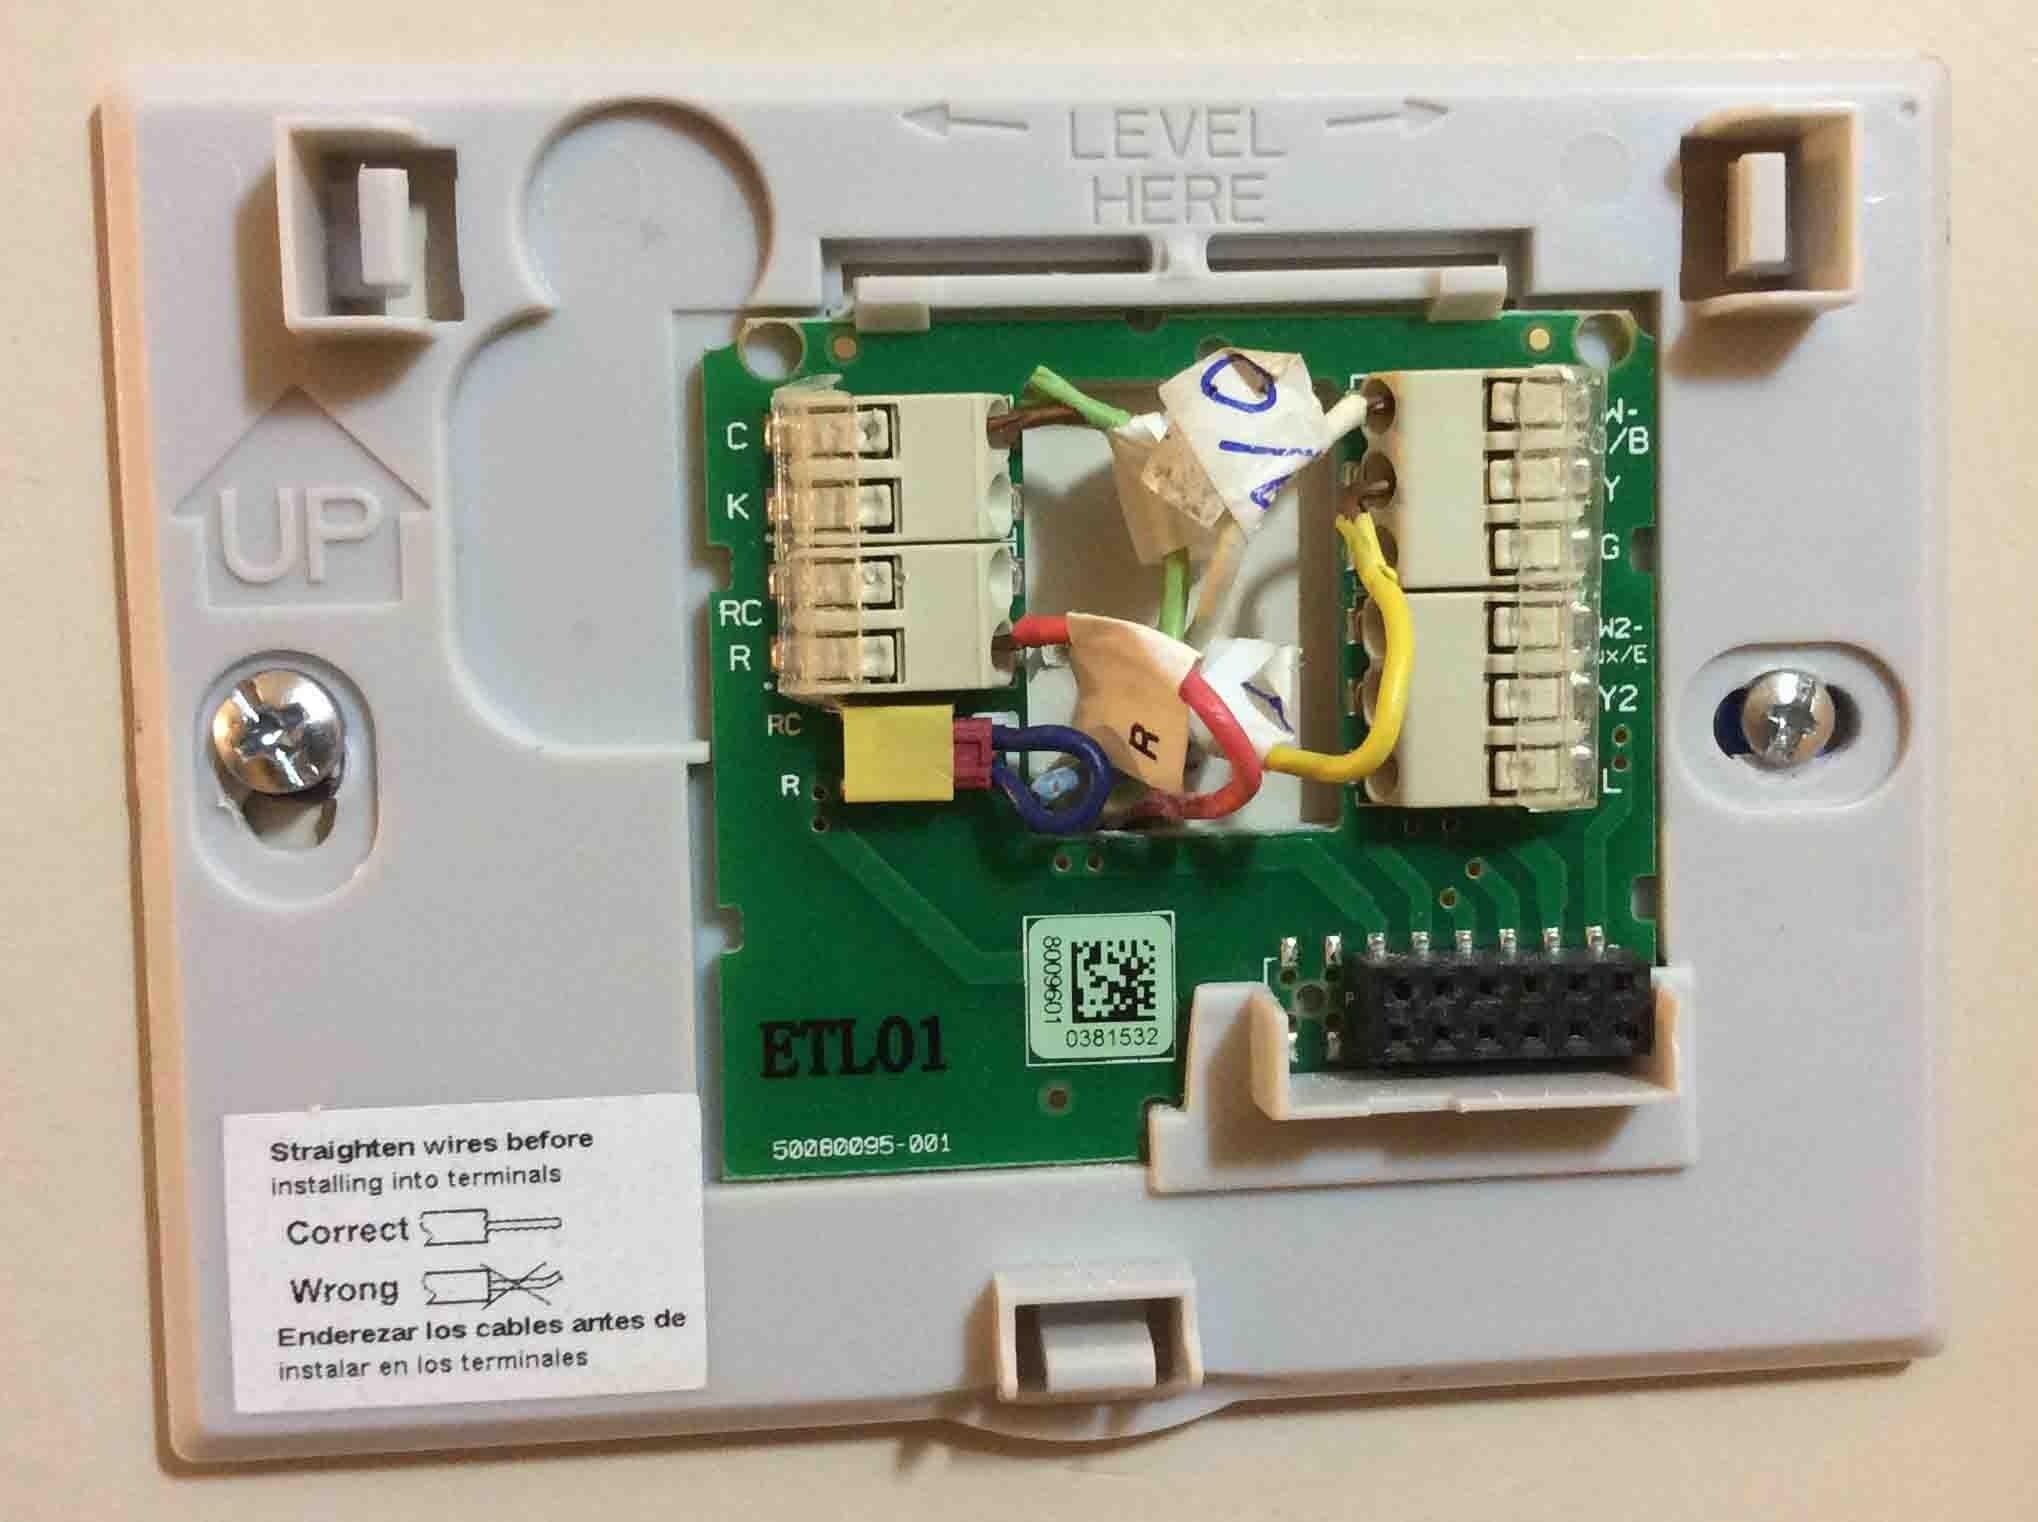 Boiler Thermostat Wiring Diagram Get Free Image About Wiring Diagram